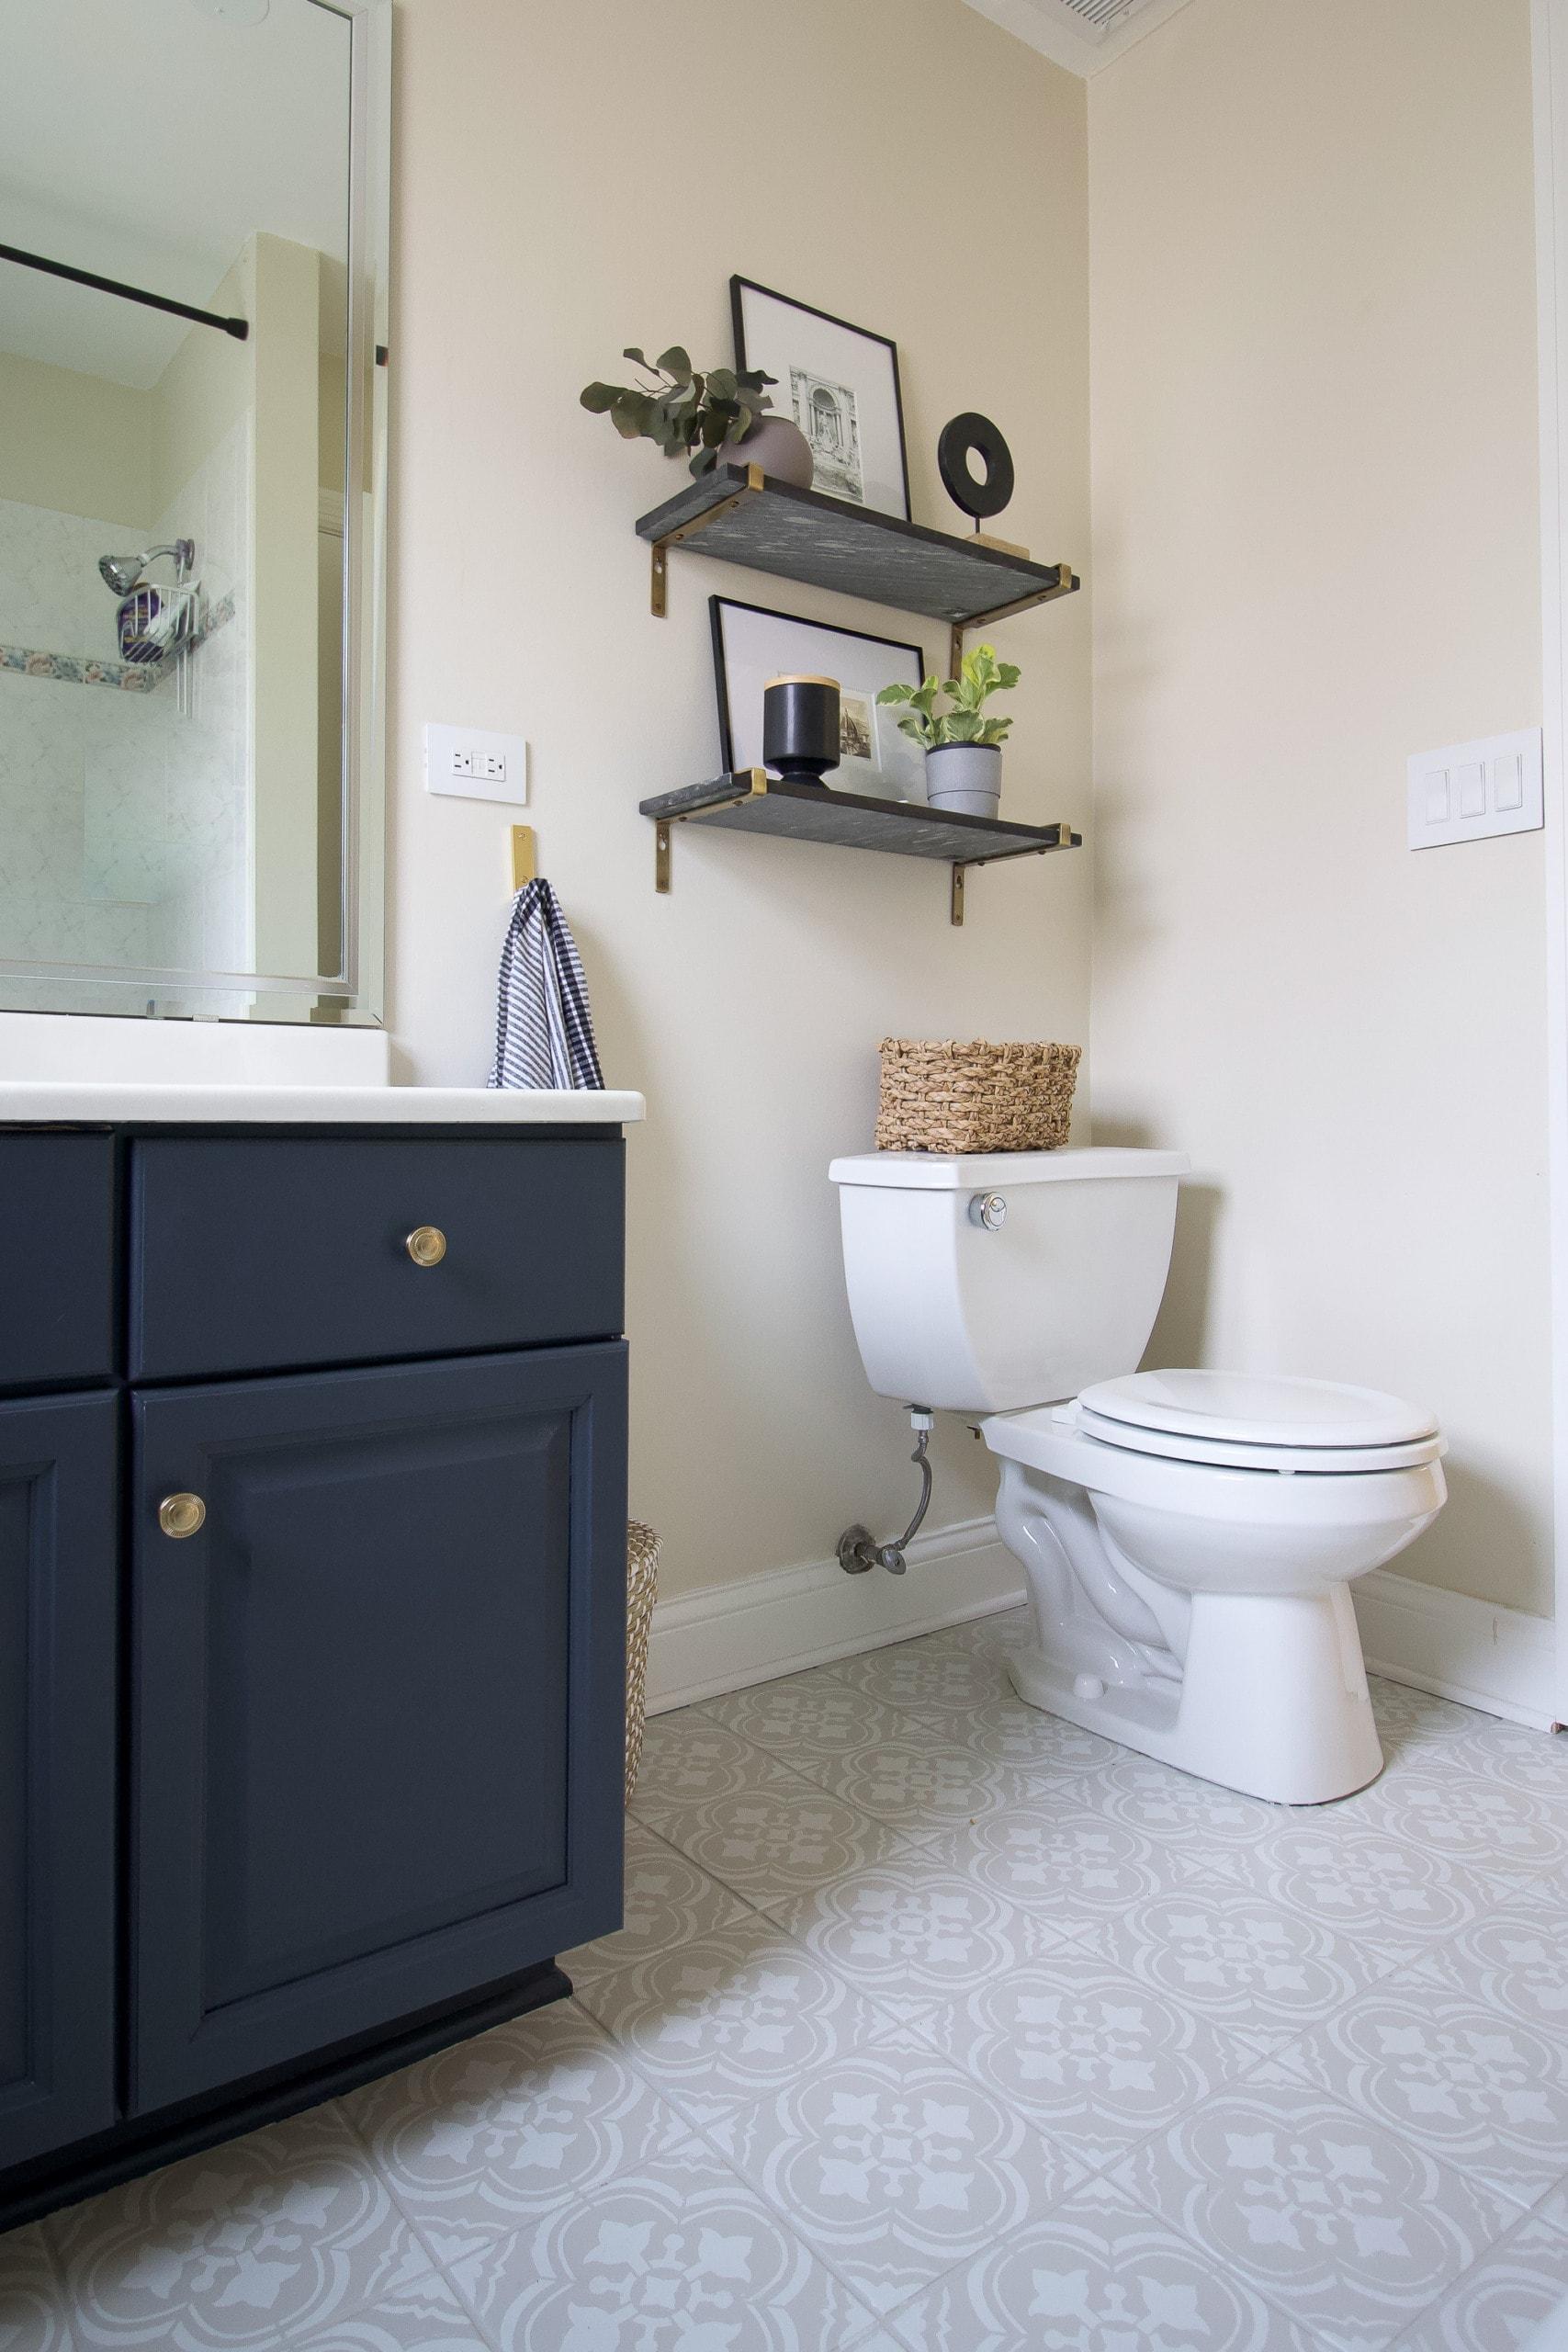 How to paint a bathroom vanity dark navy